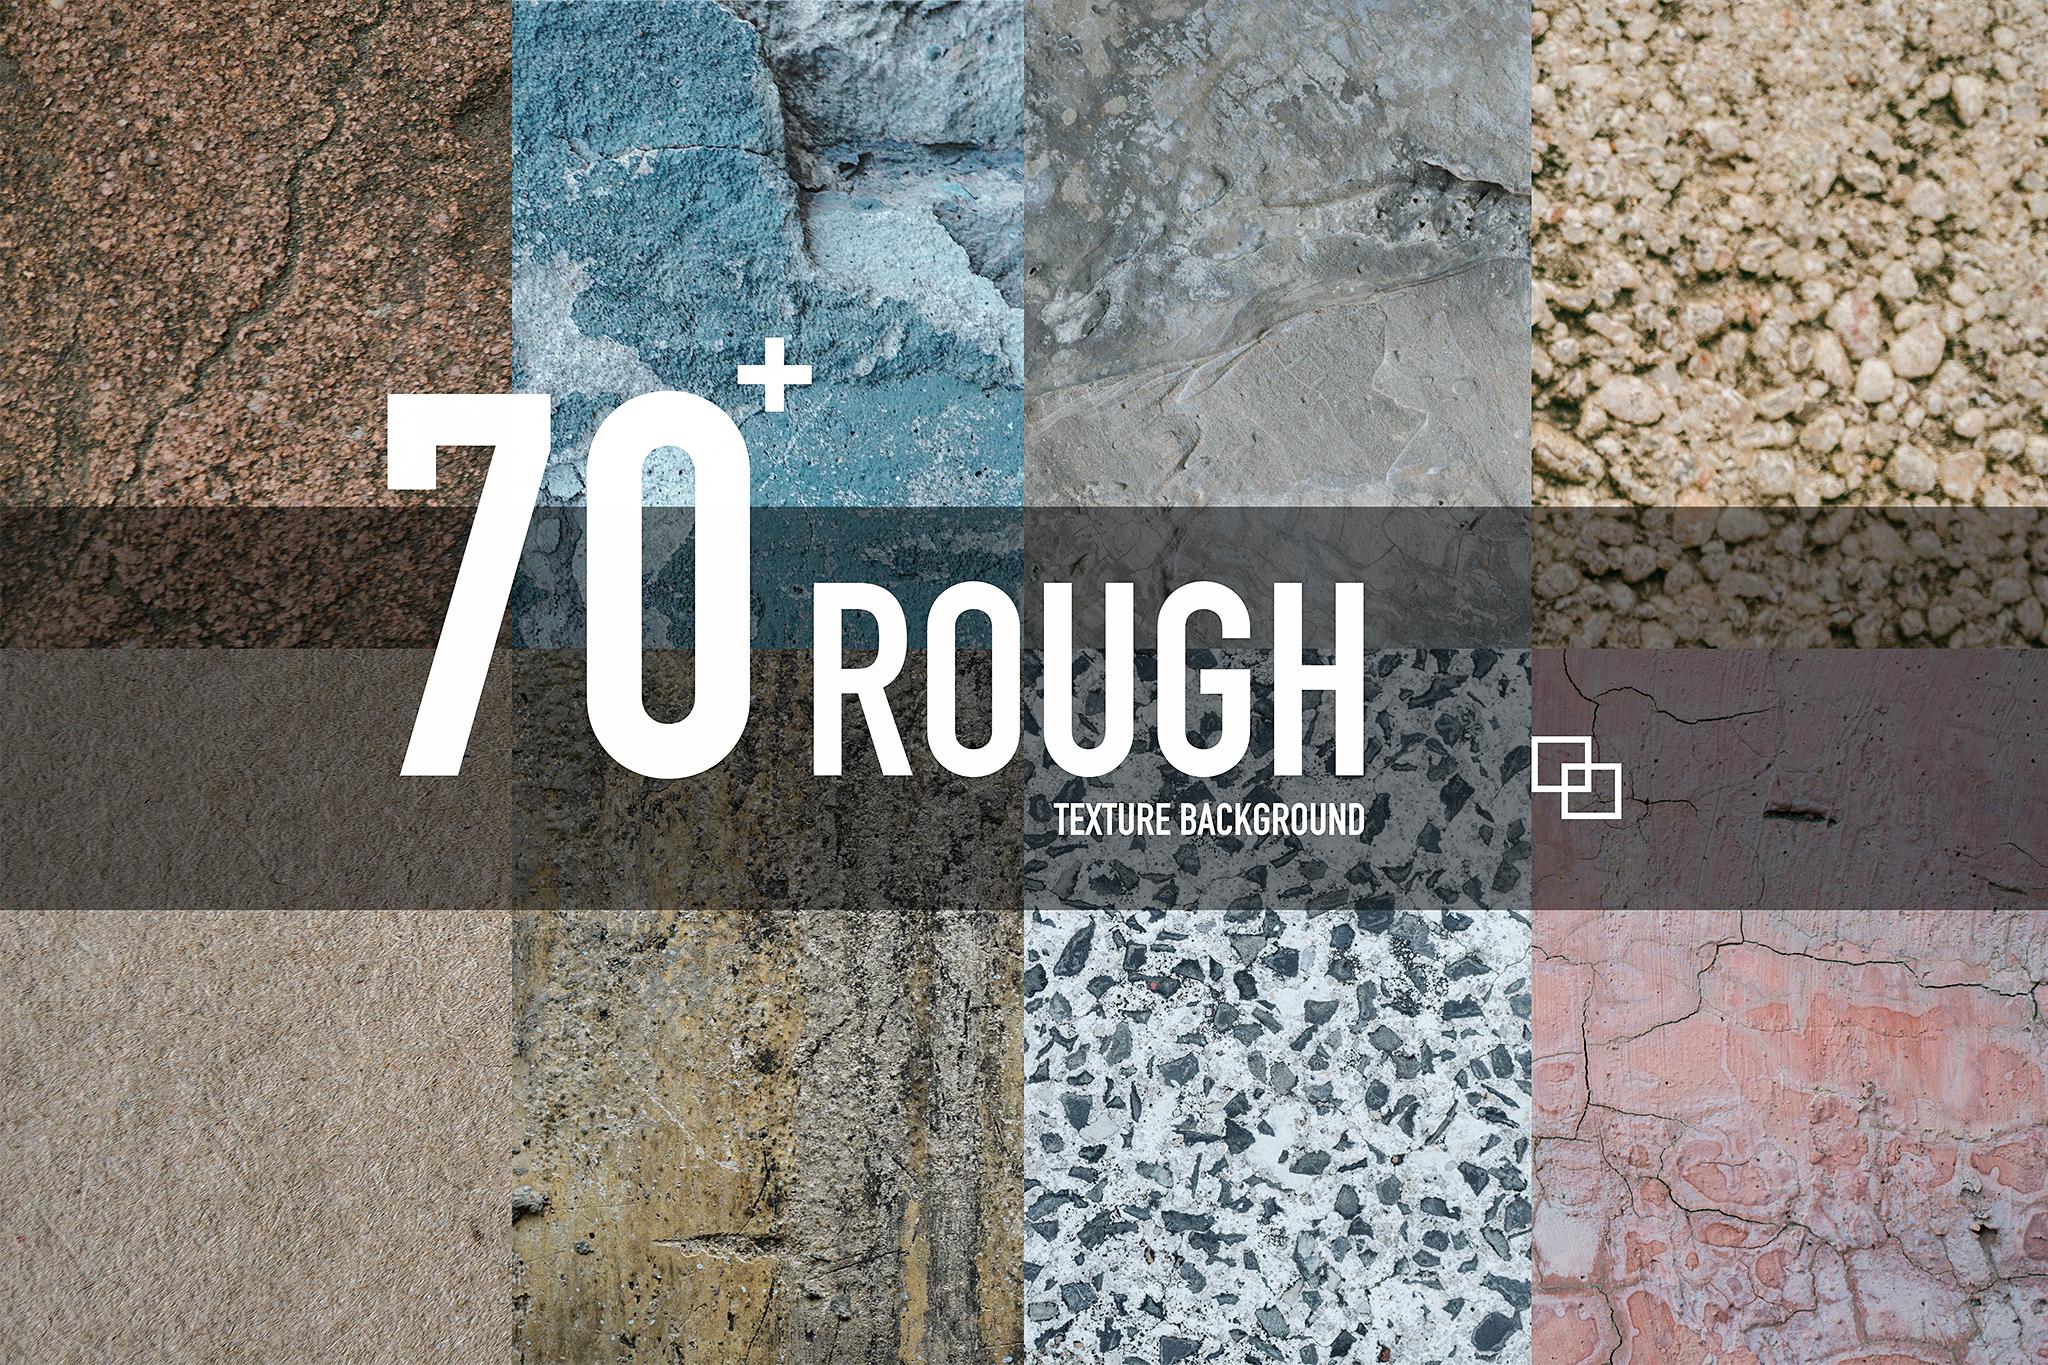 Rough Texture Background: +70 Rough Texture Background